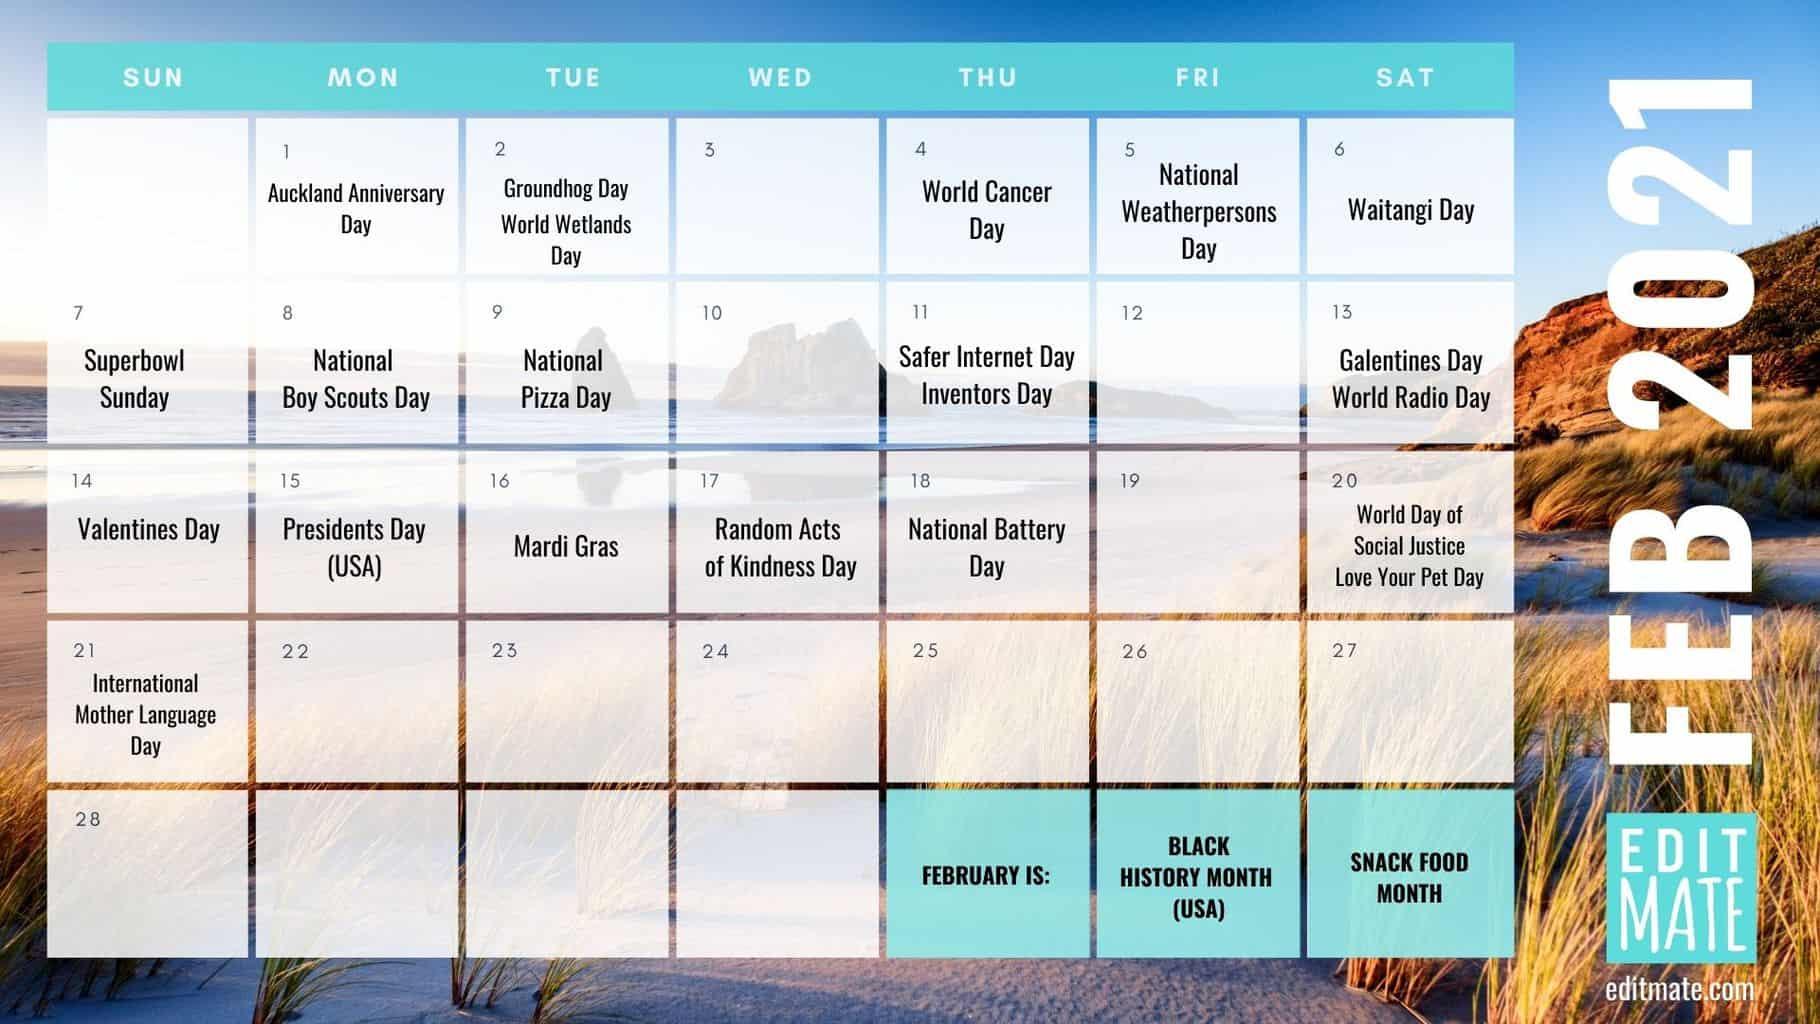 2021 Social Media Holiday Calendar | Editmate